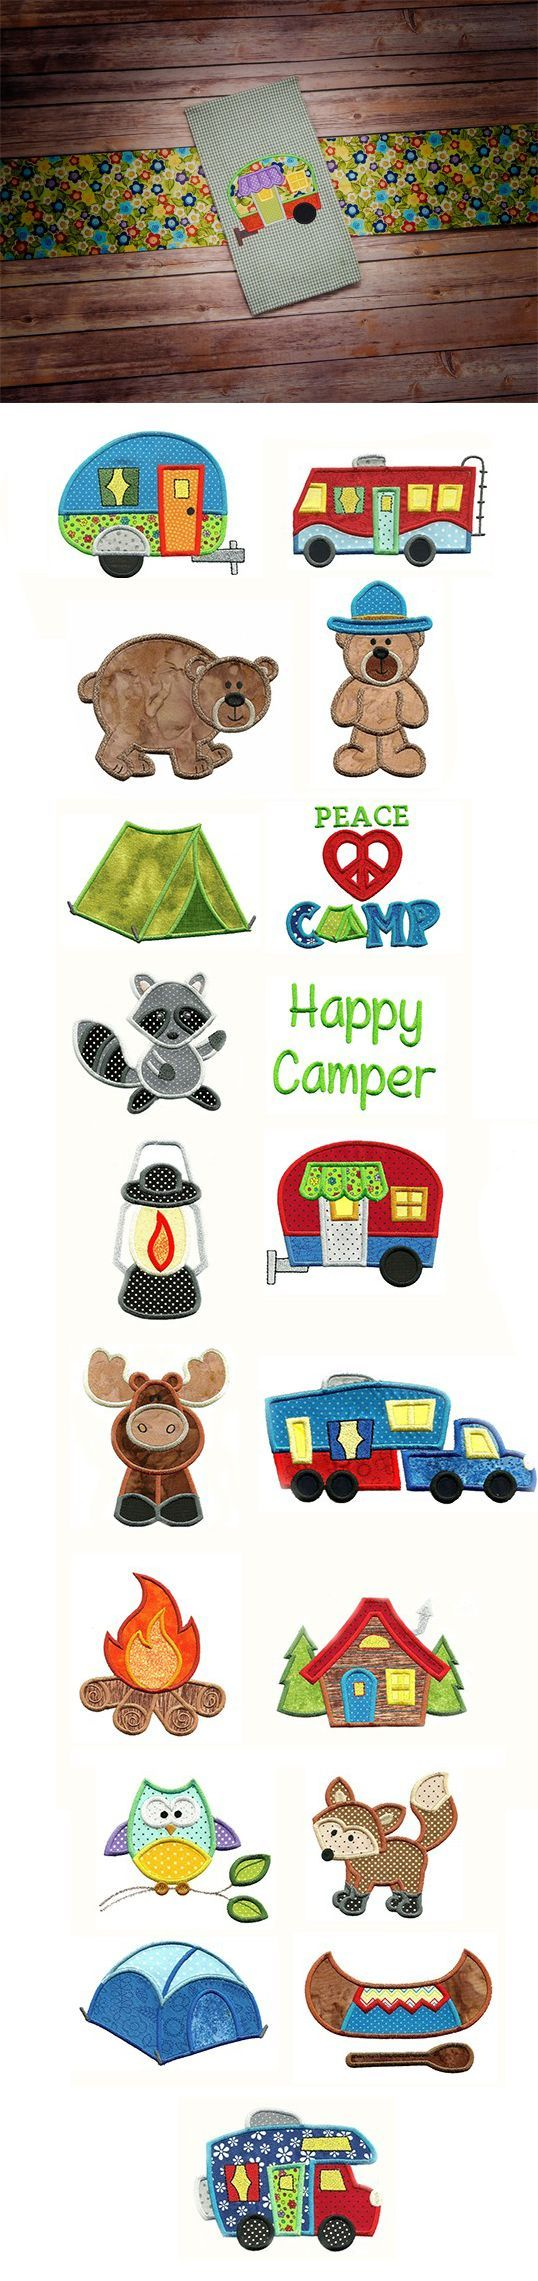 Go Camping Applique design set available for instant download at designsbyjuju.com